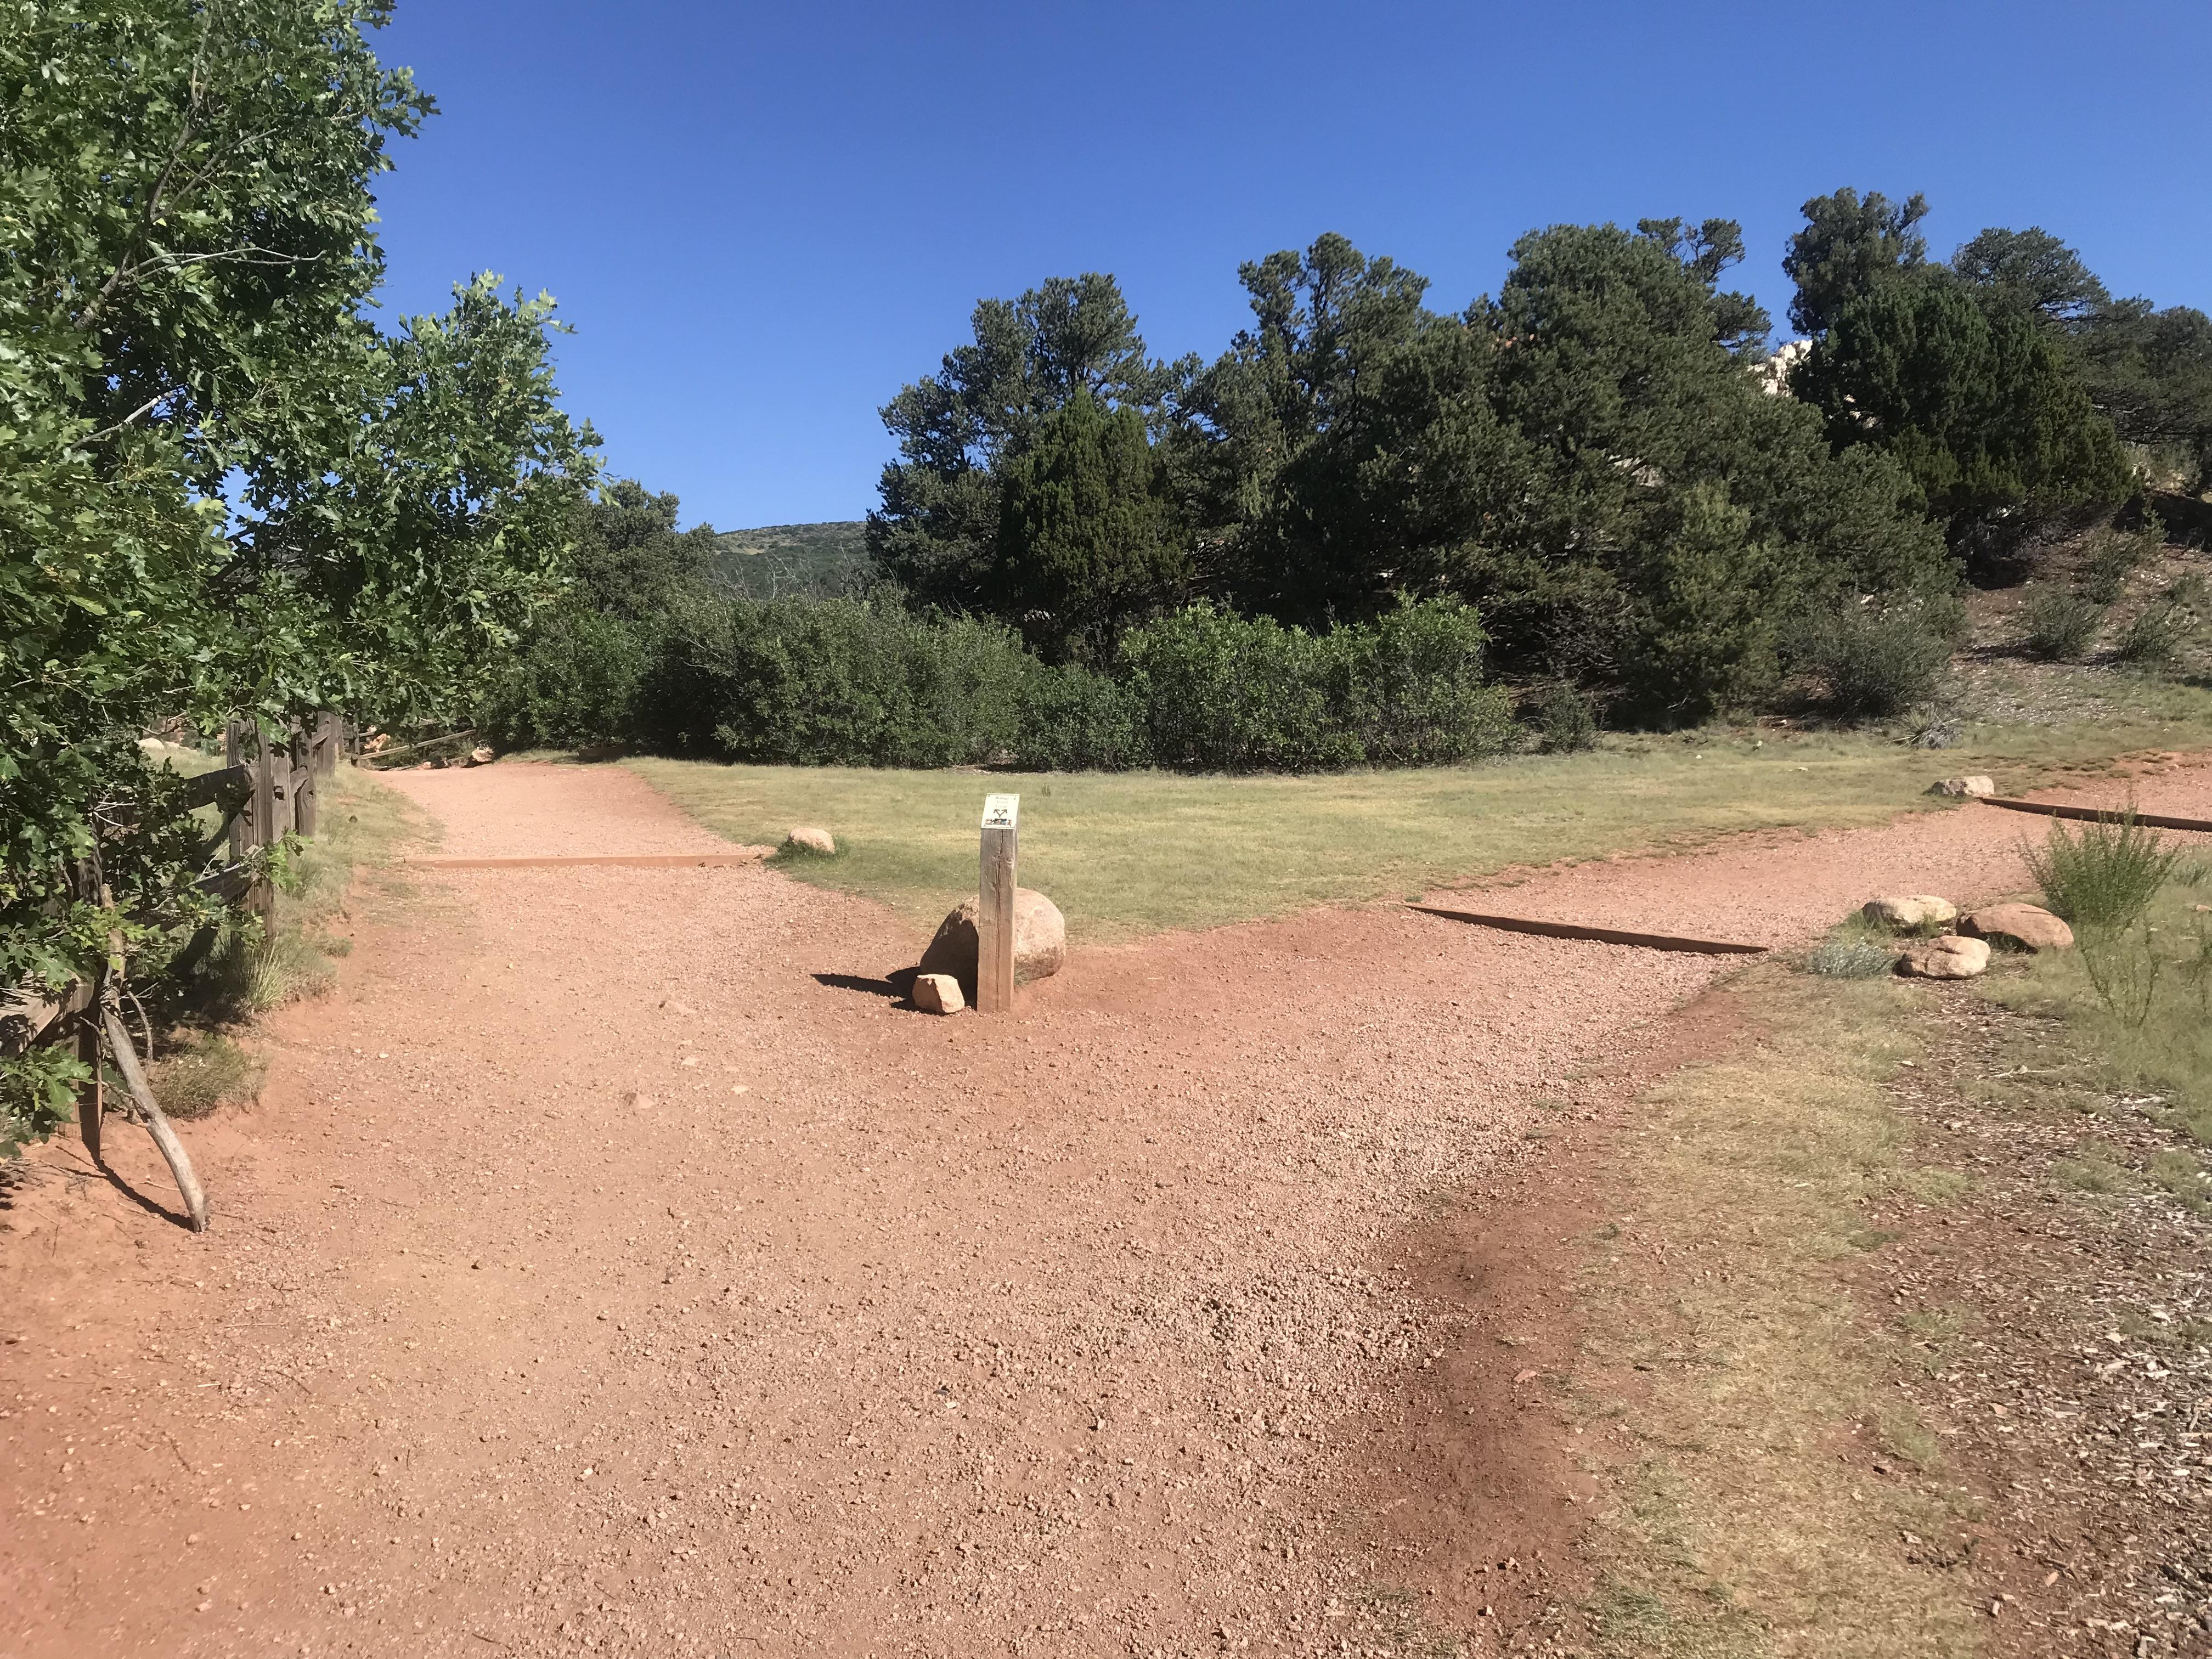 Garden of the Gods Trail